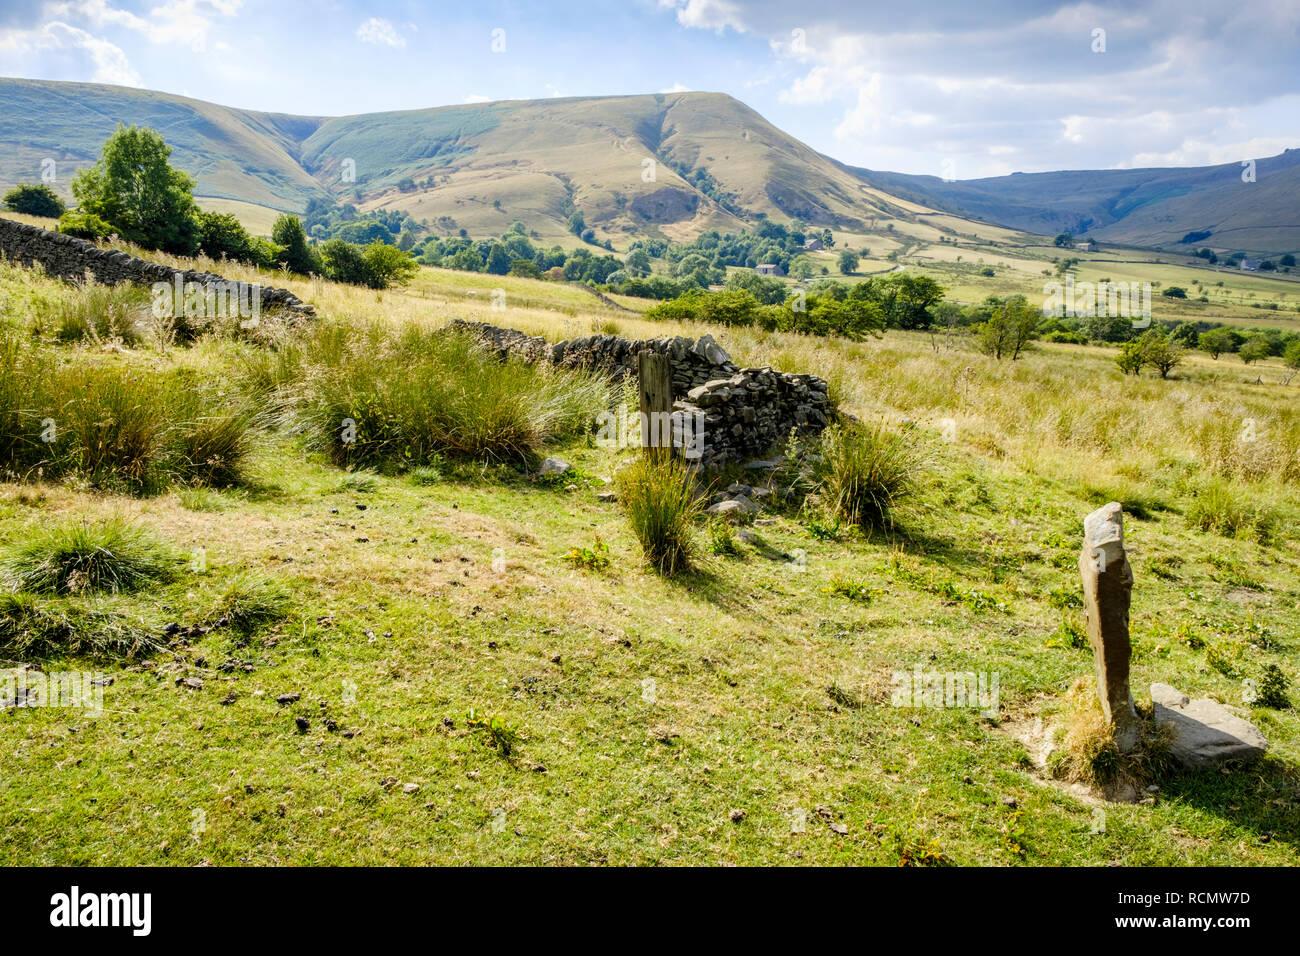 The Vale of Edale in Summer sunshine, Derbyshire, Peak District, England, UK - Stock Image